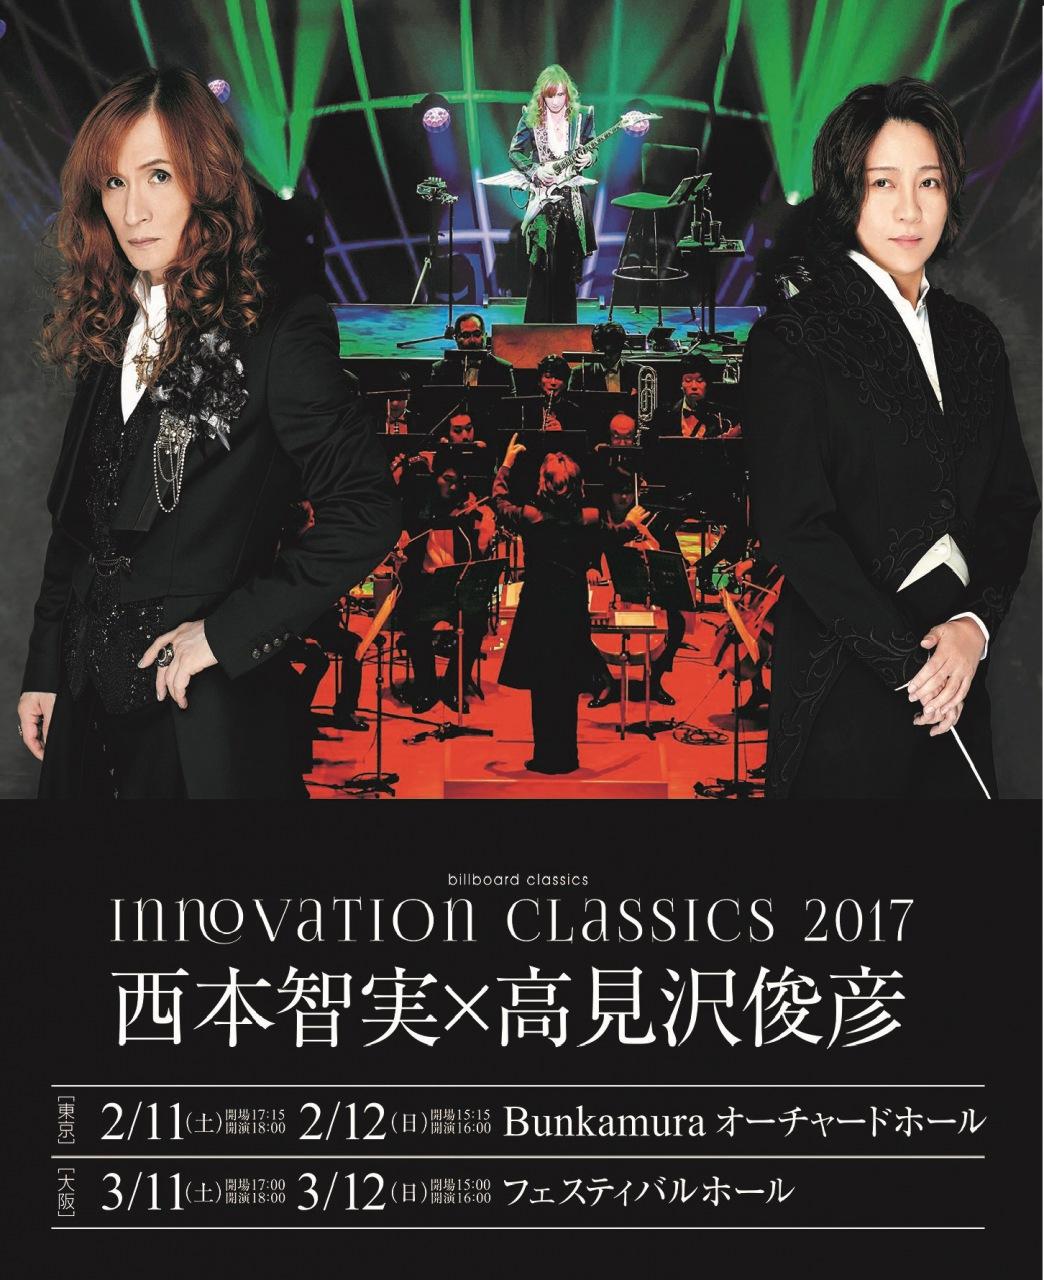 【THE ALFEE楽曲も演奏】西本智実×高見沢俊彦 「INNOVATION CLASSICS 2017」公演楽曲発表